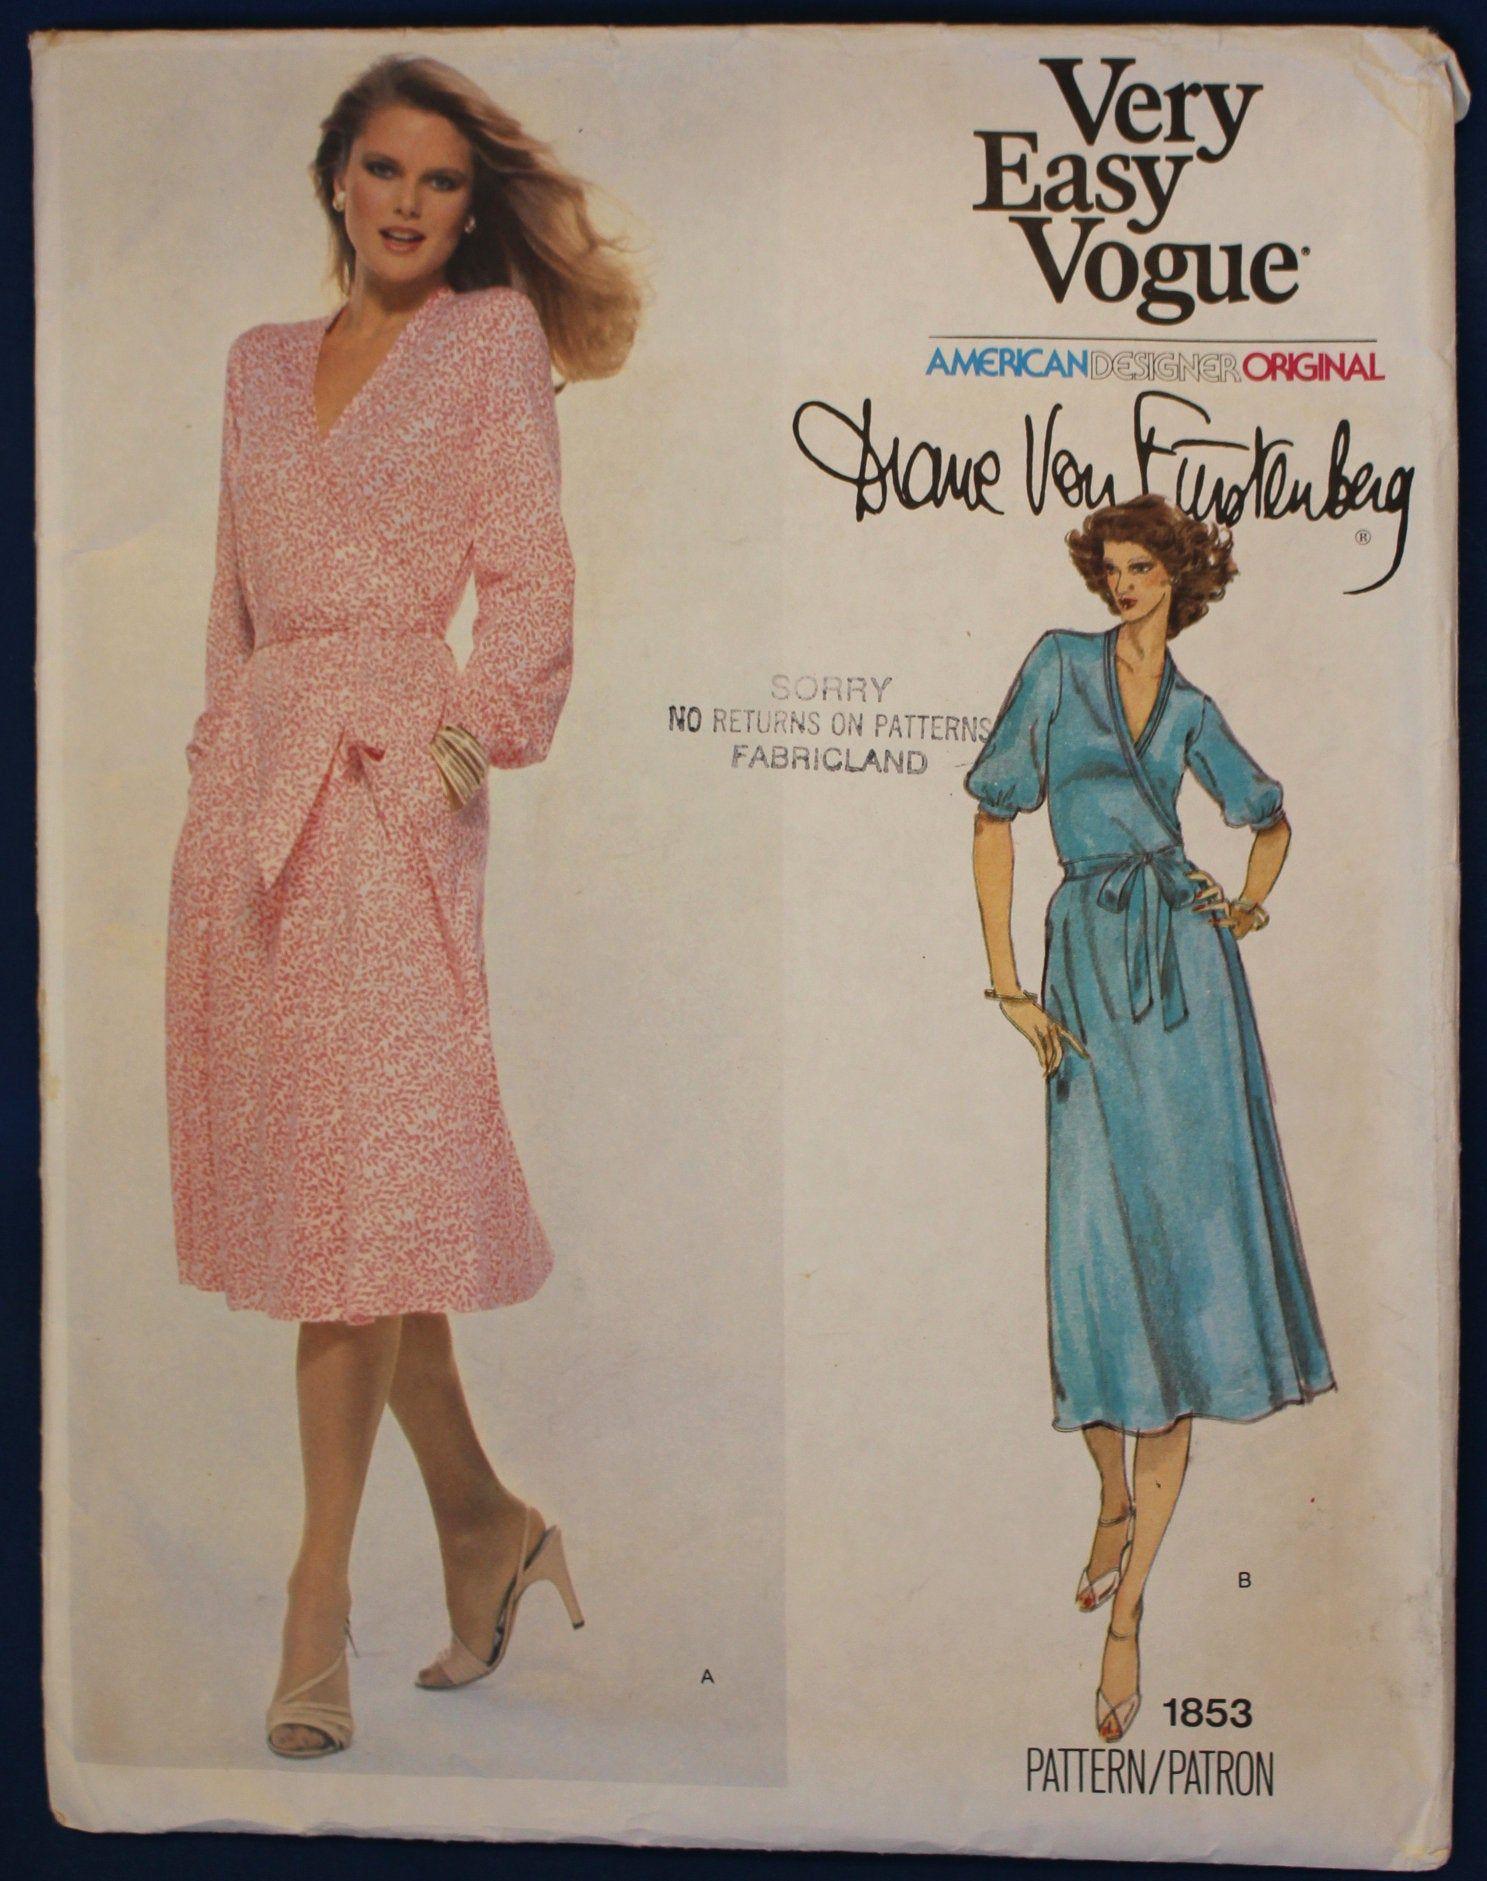 Diane Von Furstenberg Vogue 1853 American Designer Original Vintage Wrap Dress Sewing Patter In 2020 Wrap Dress Sewing Patterns Vintage Wrap Dress Vogue Patterns